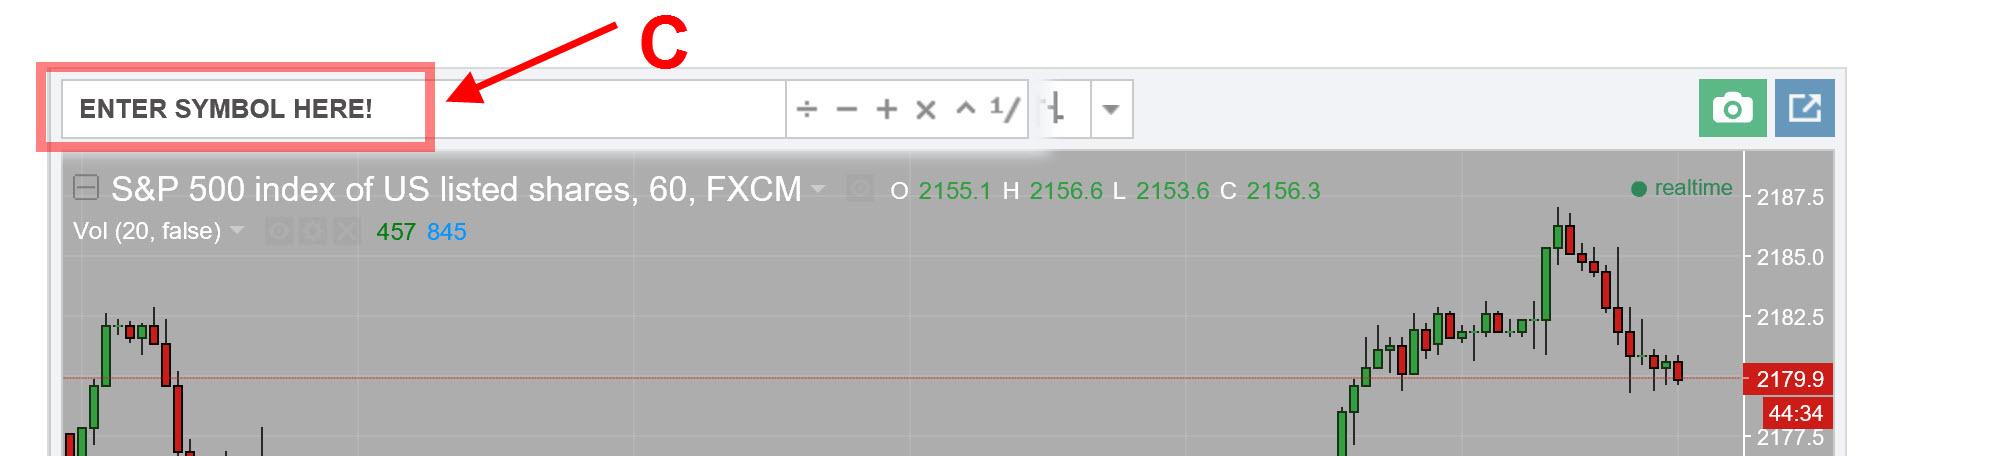 Trading View Dynamic Chart